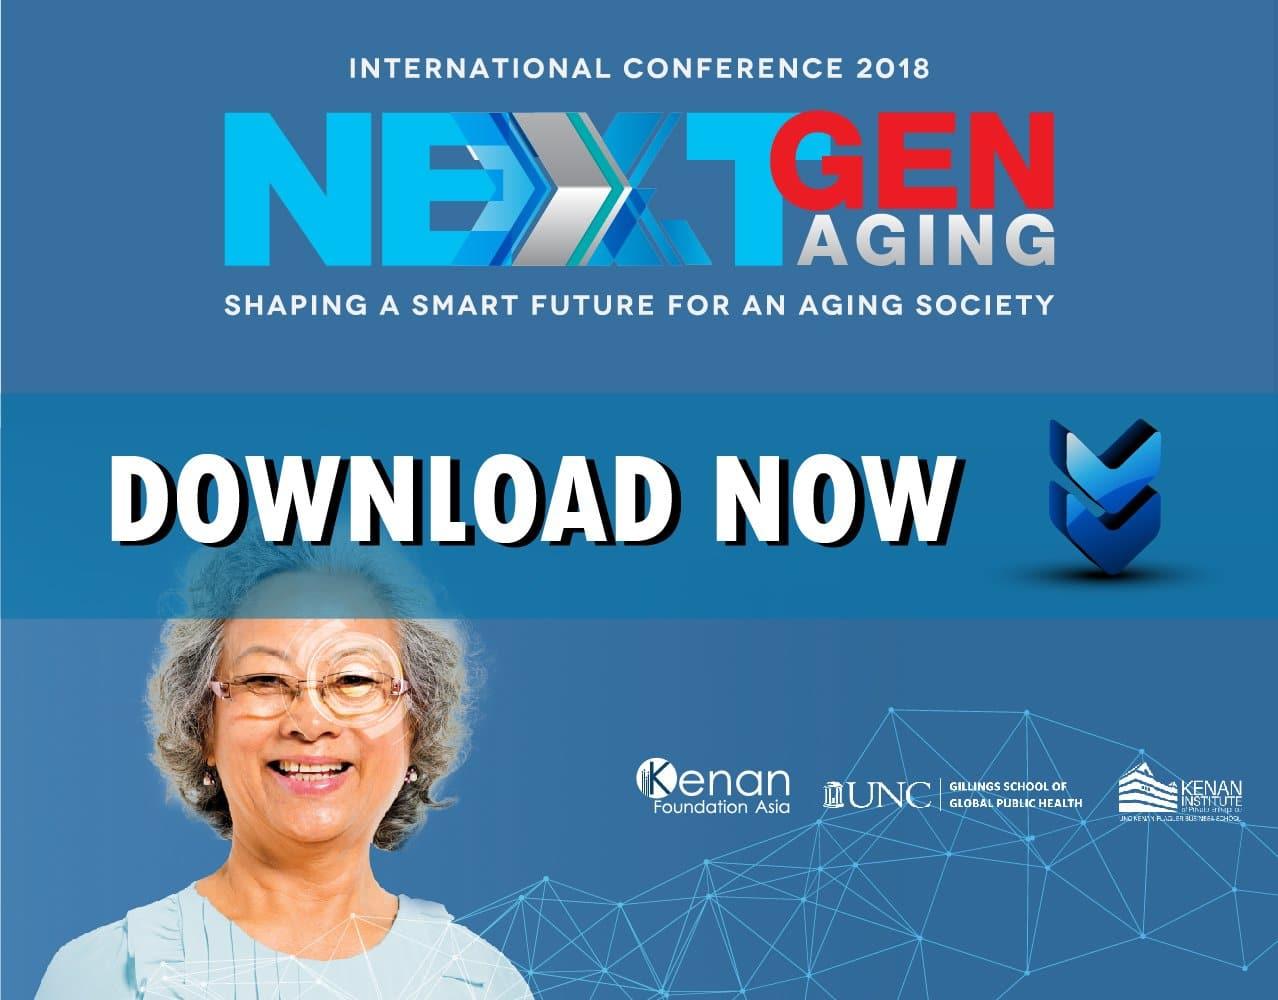 NextGen Aging Conference 2018 booklet 1